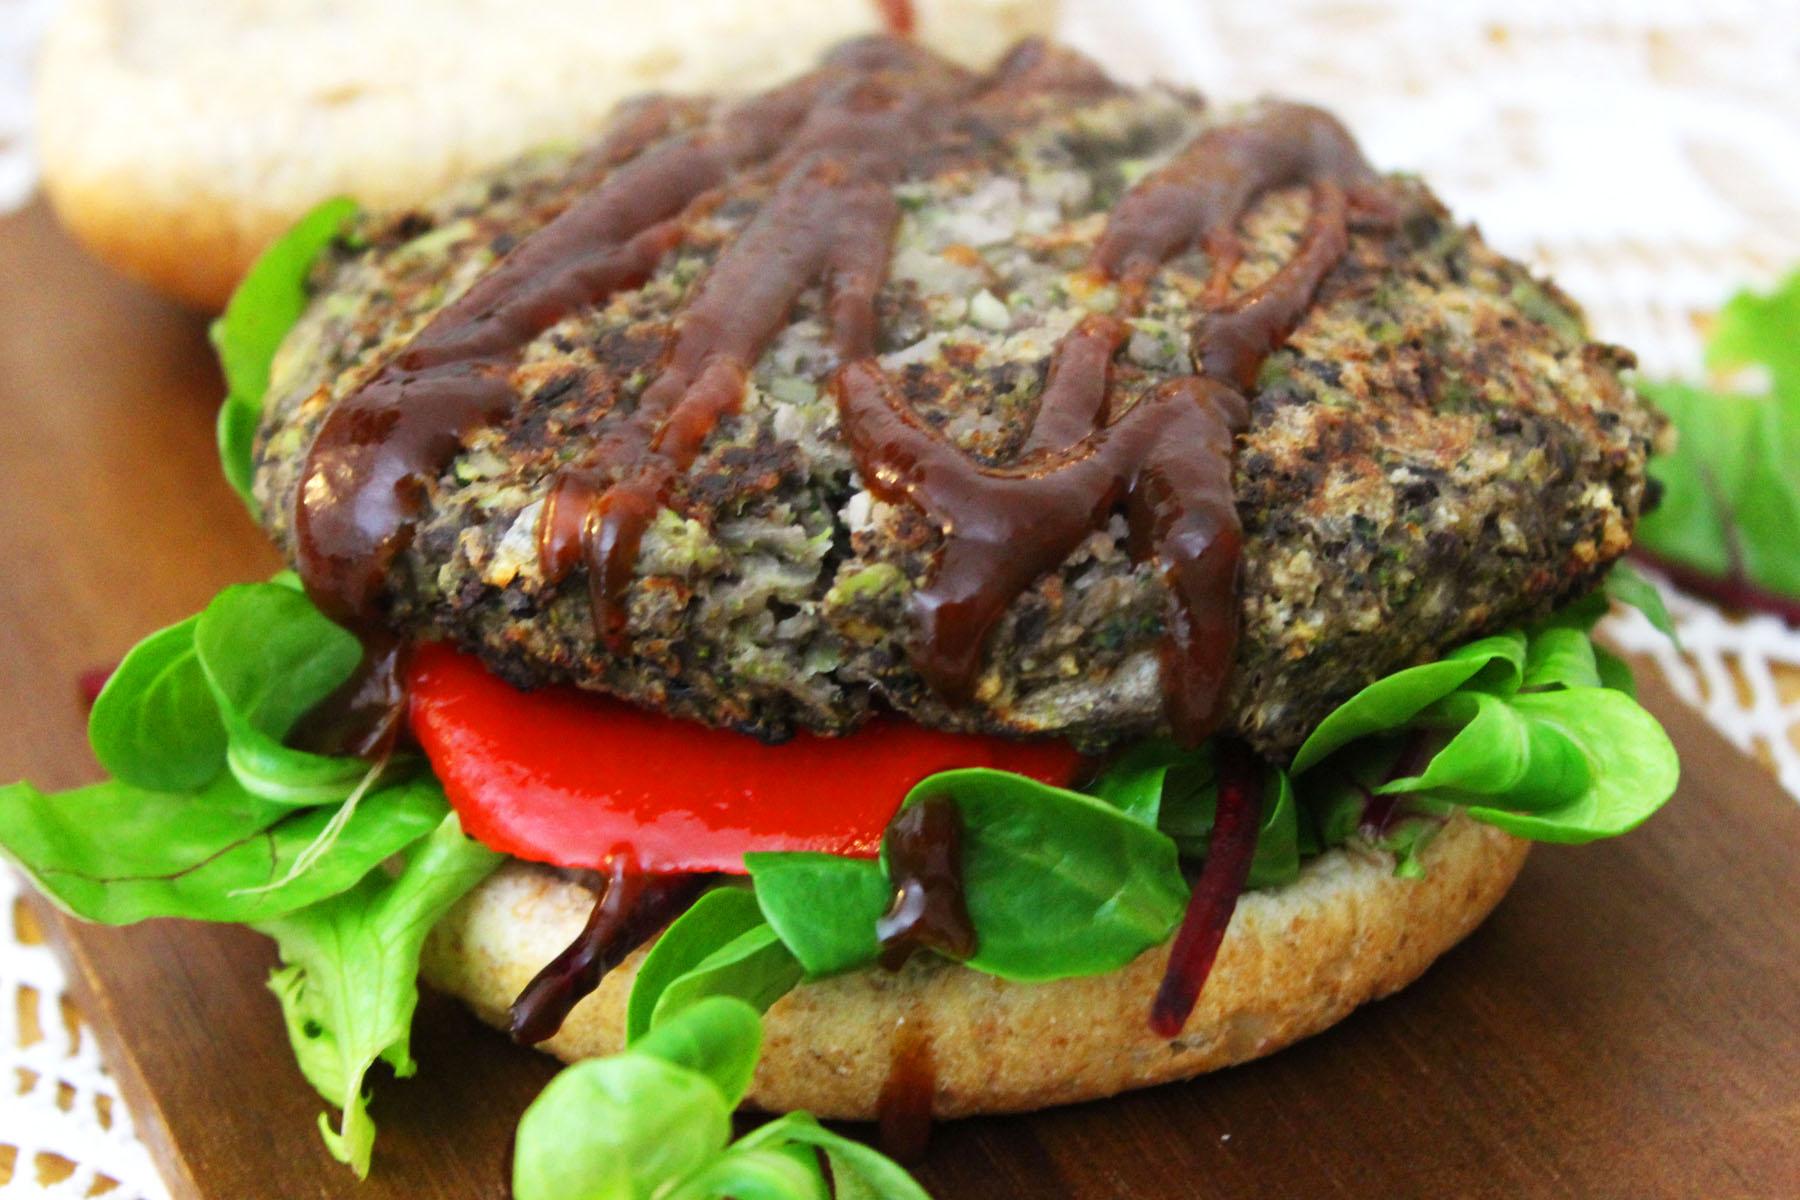 BBQ Portobello Mushroom and Black Bean Burgers